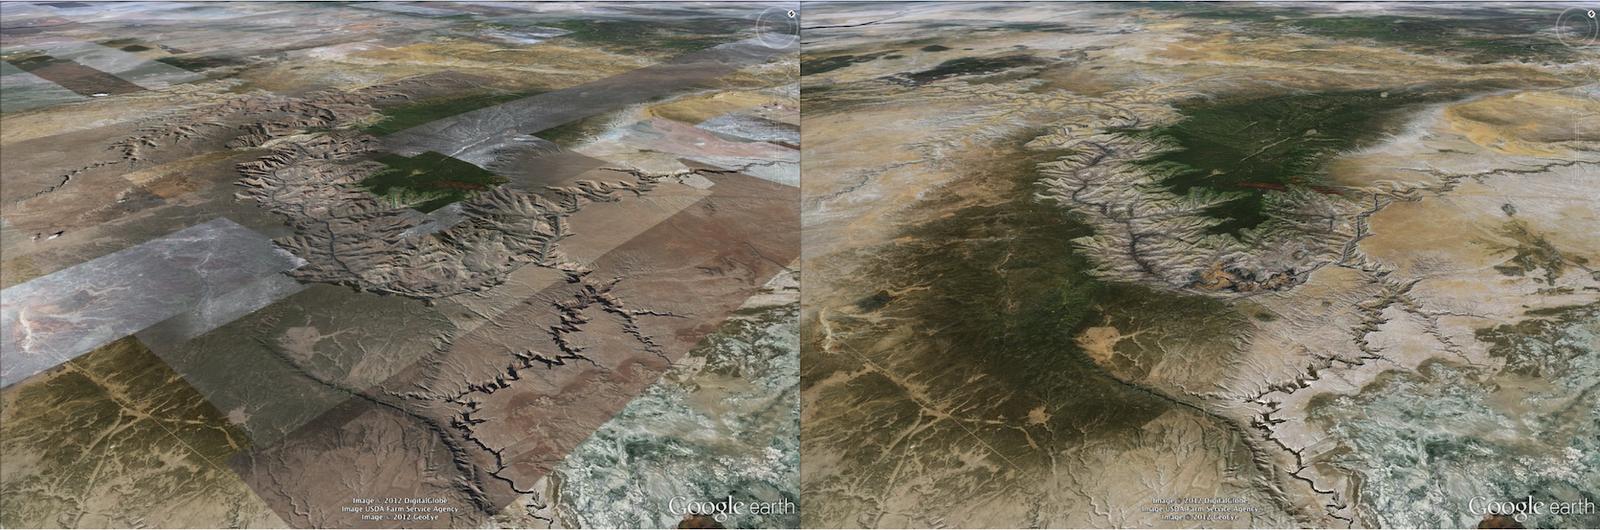 Google Earthがより滑らかに 「Google Earth 6.2」リリース